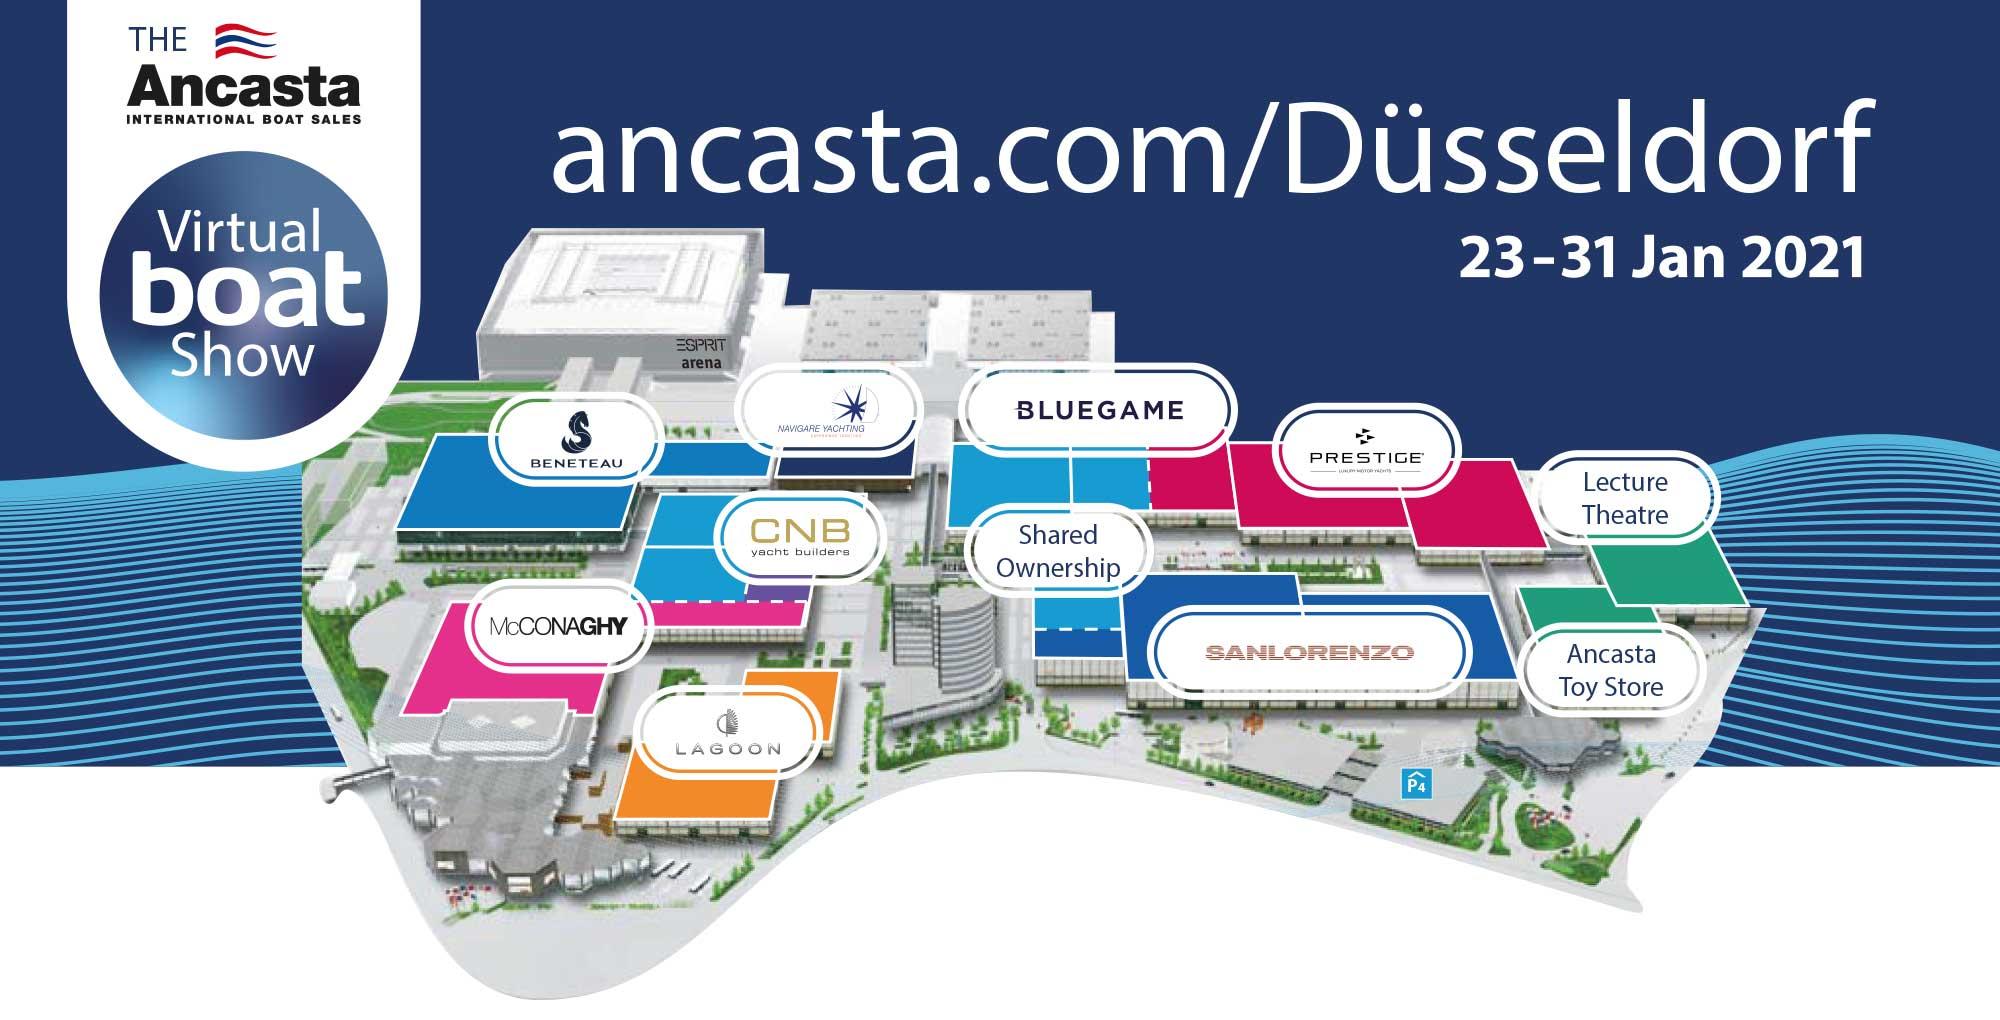 Virtual boat show dusseldorf map